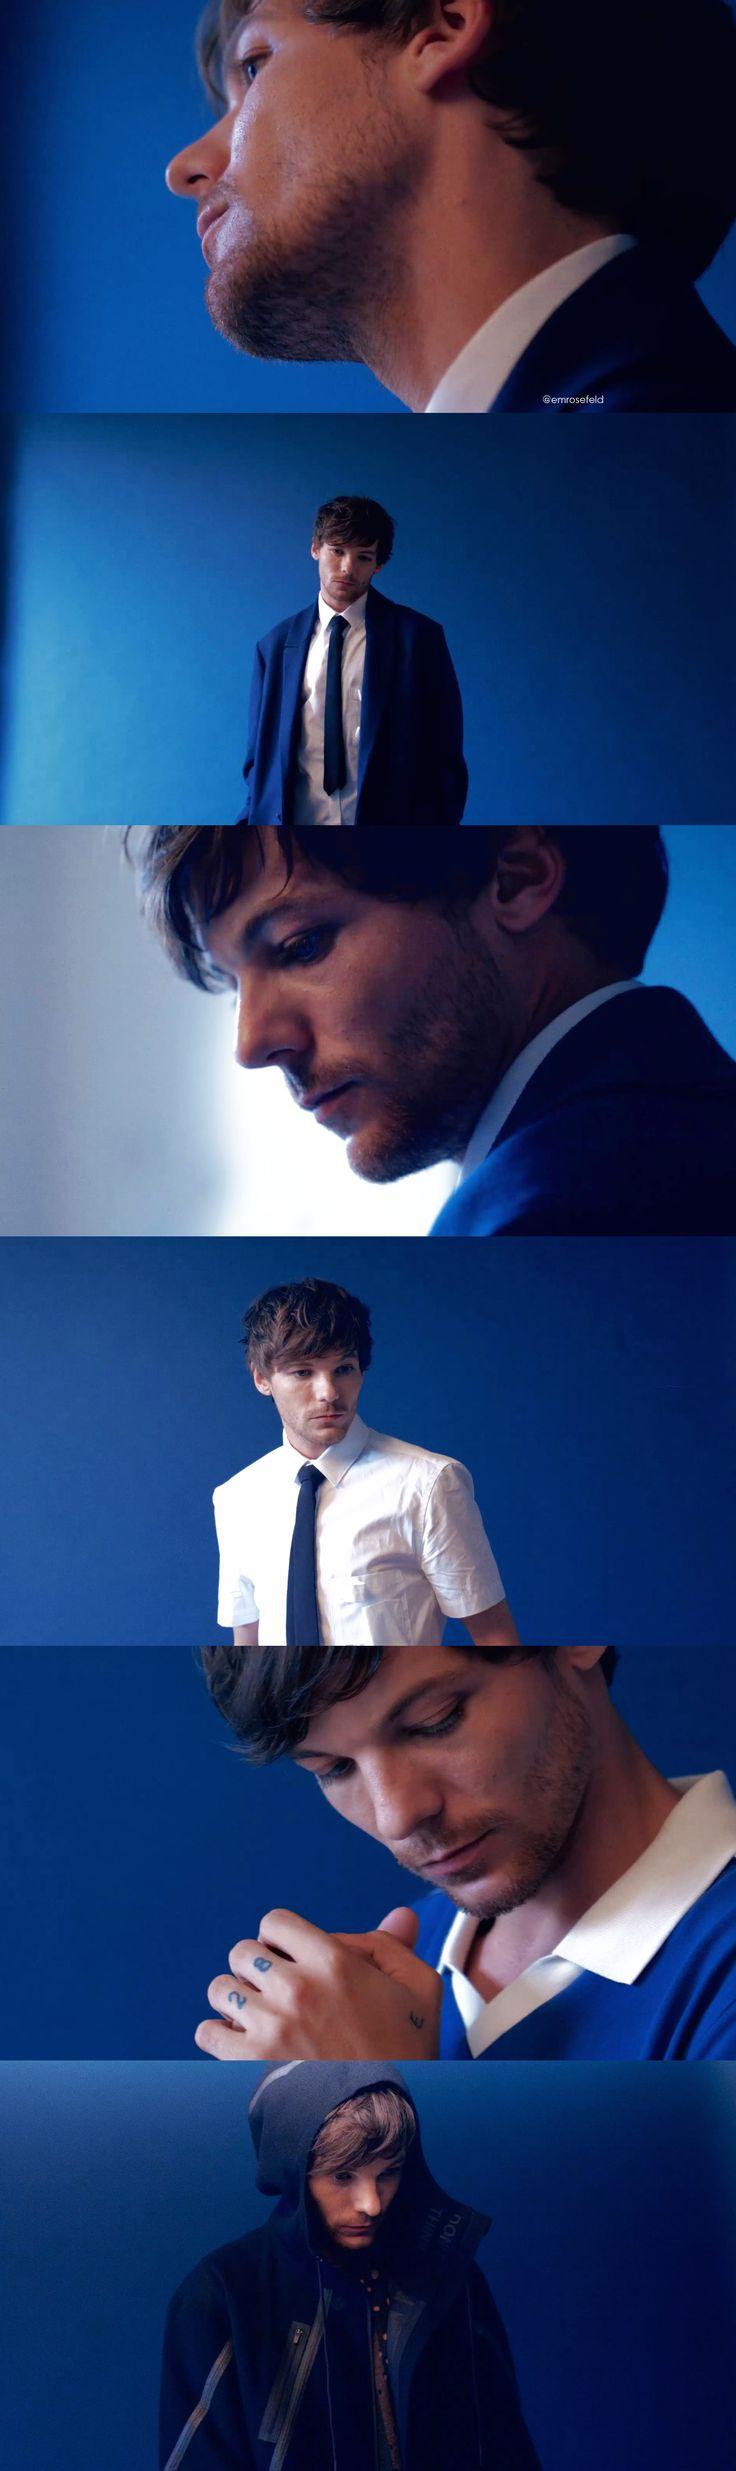 Louis Tomlinson | BTS SID magazine | emrosefeld |